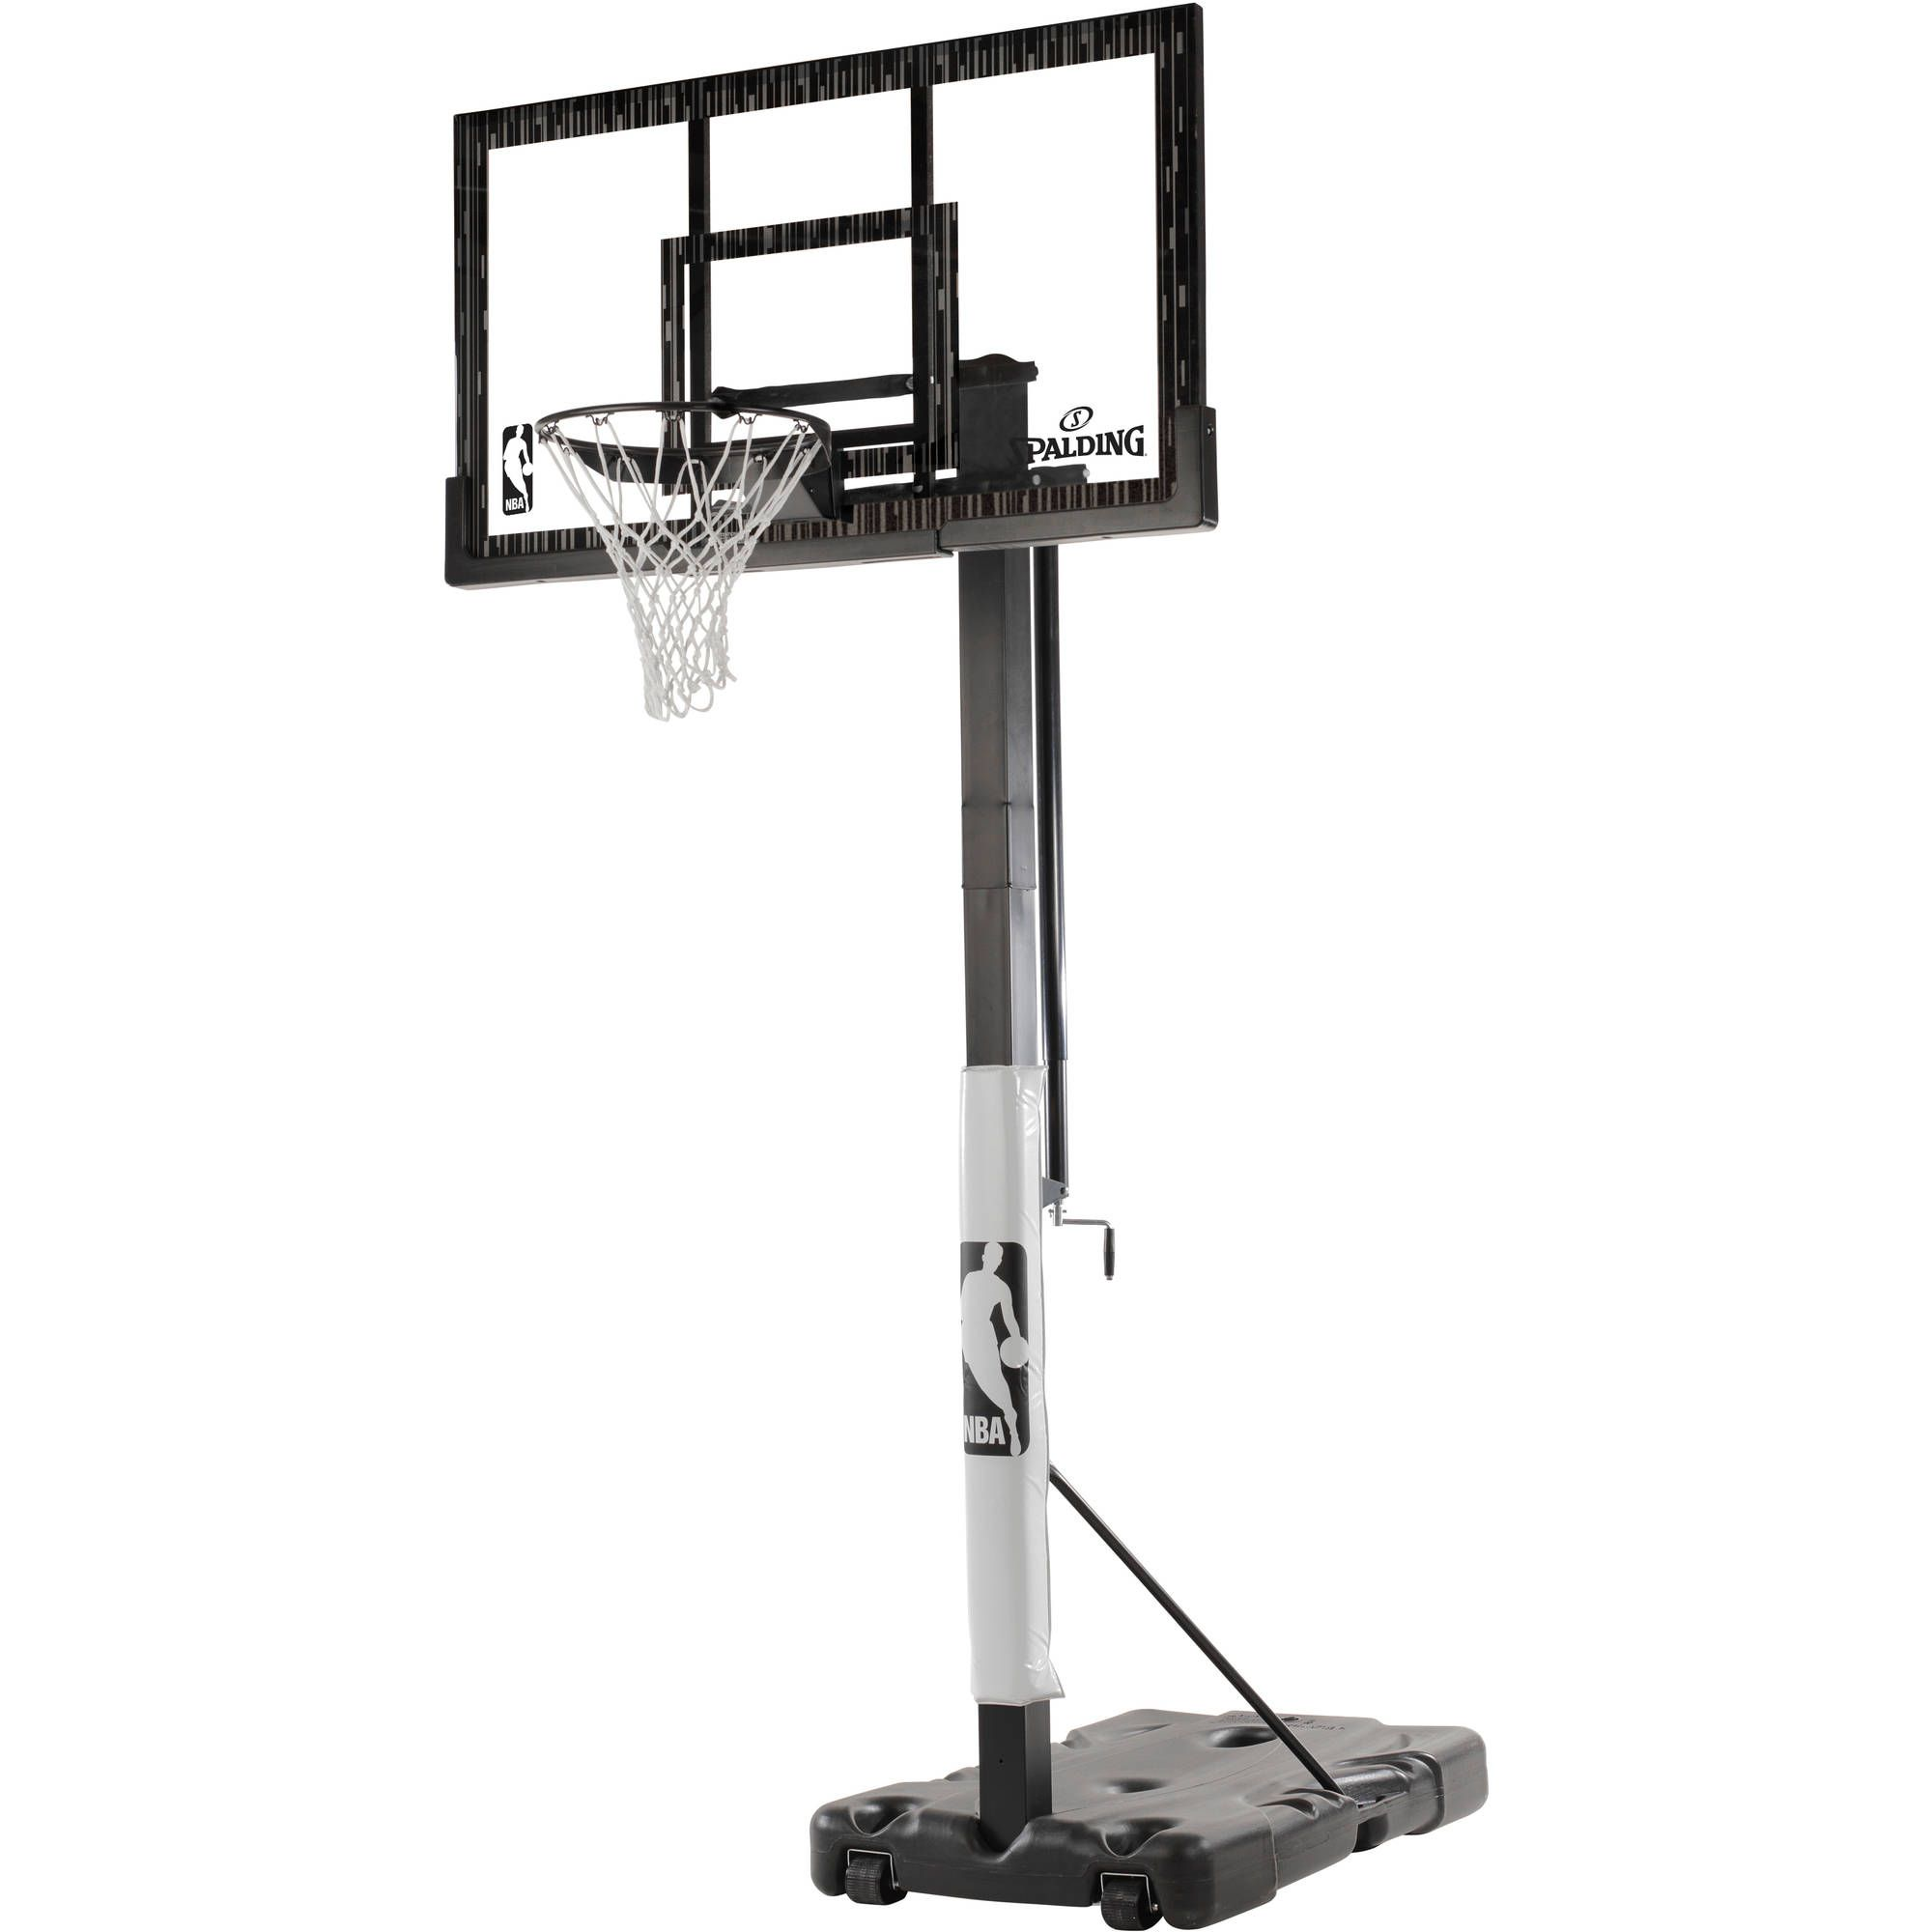 Spalding Nba 60 Acrylic Screw Jack Portable Hoop System Walmart Com Portable Basketball Hoop Adjustable Basketball Hoop Basketball Backboard